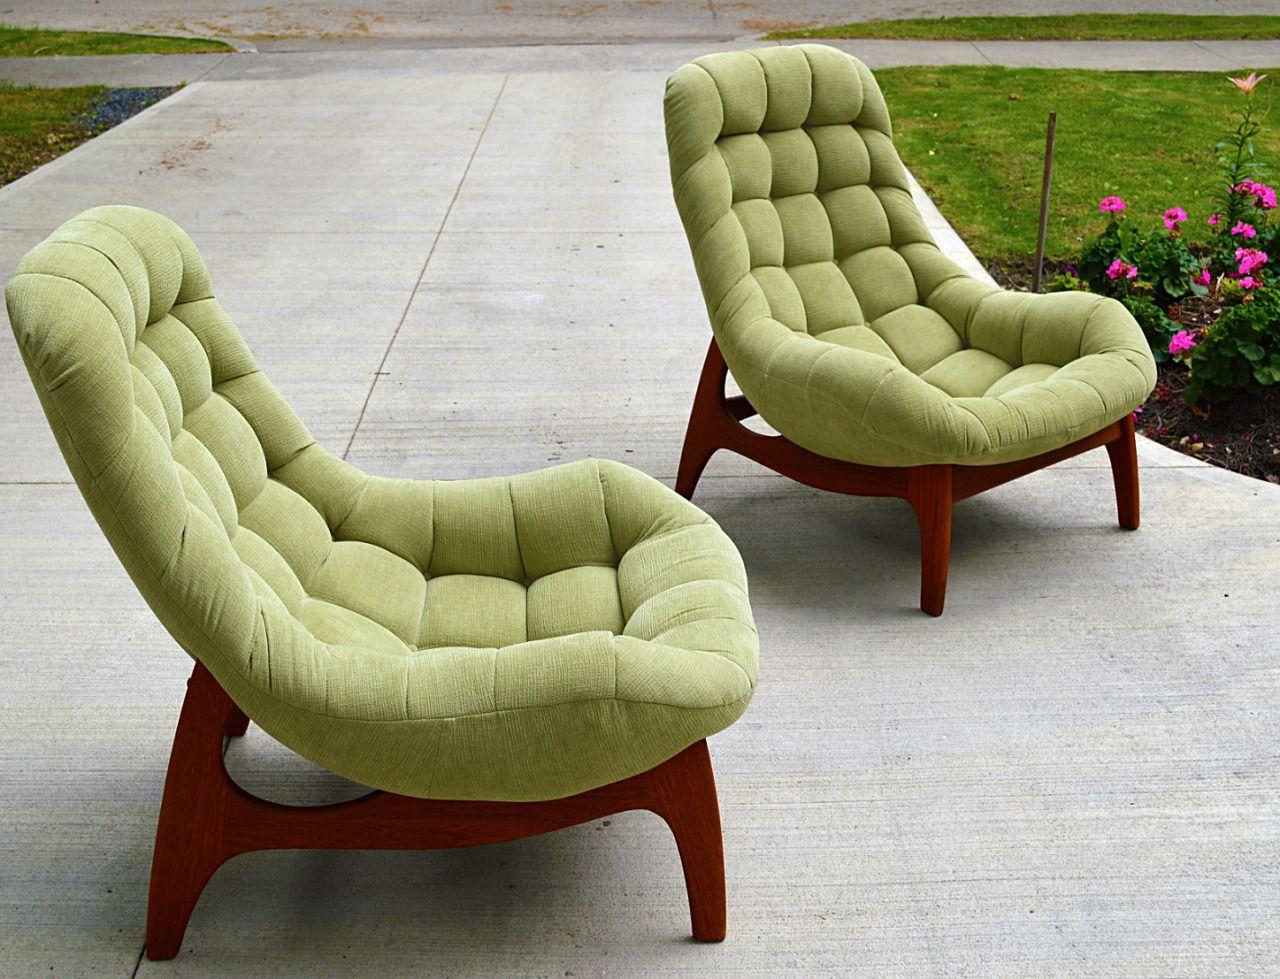 Midcenturymodernfreak Vintage Mid Century Furniture Mid Century Furniture Century Furniture